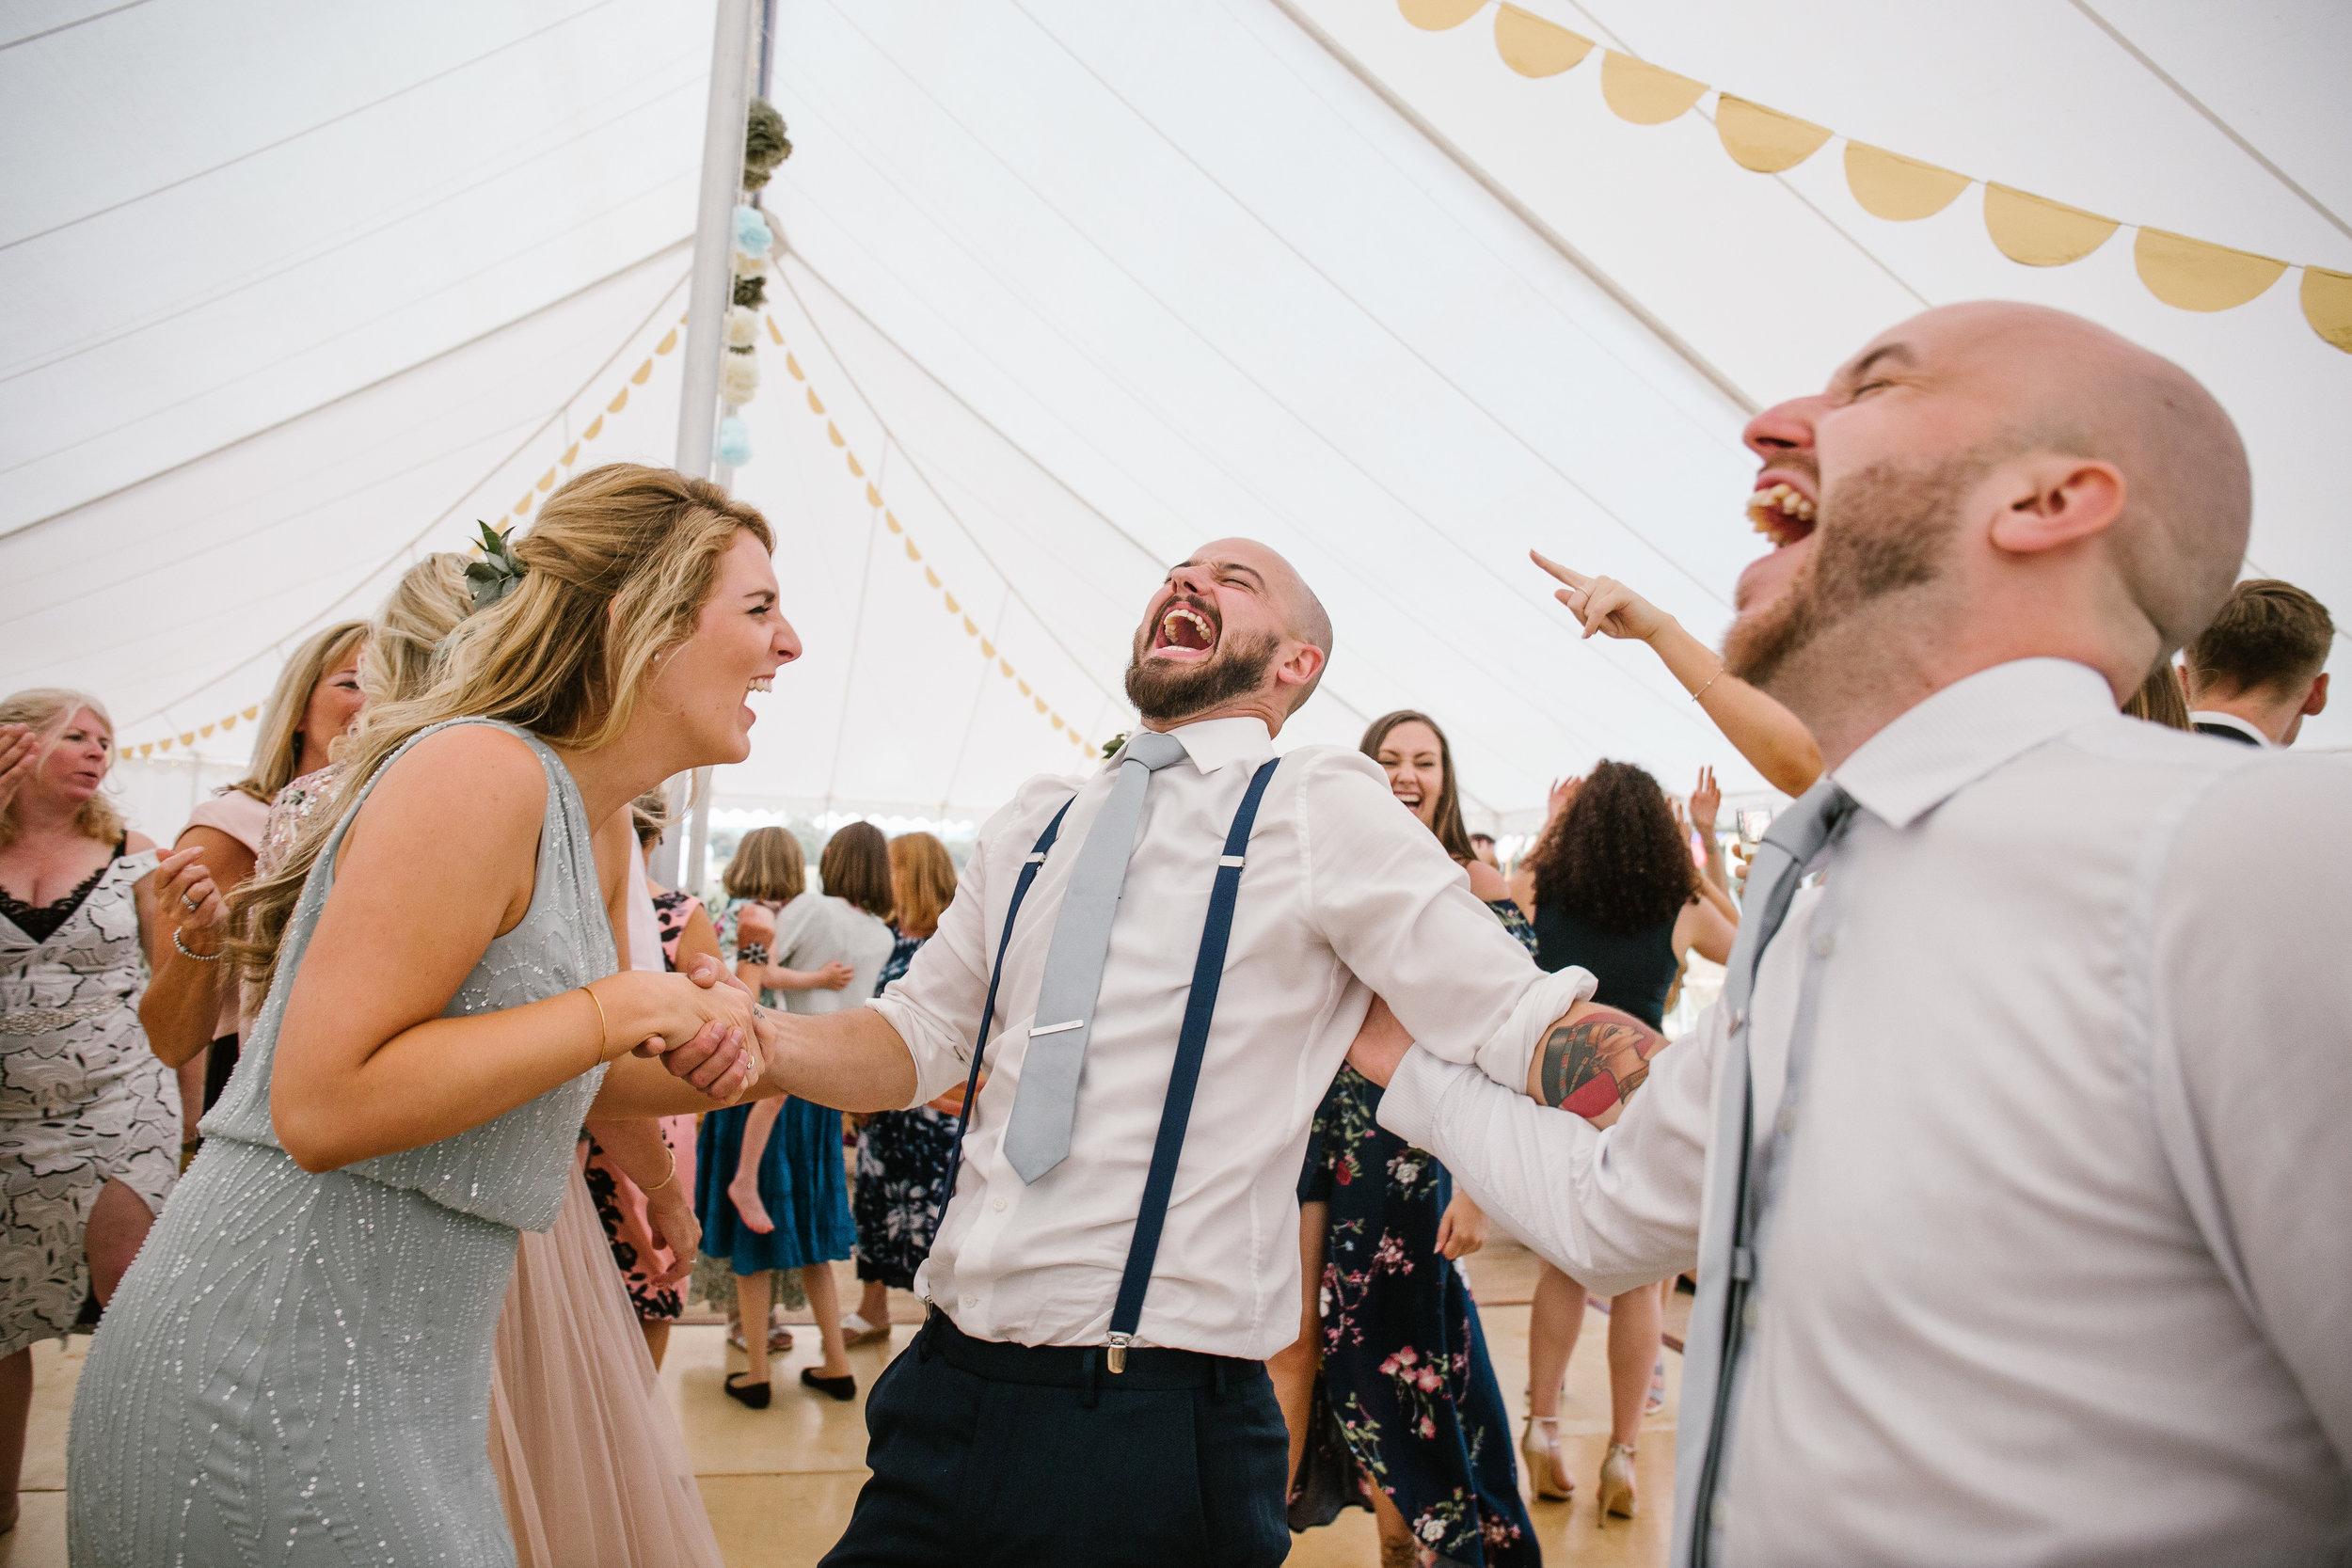 Cotswolds wedding, cotswolds wedding photographer, DIY wedding, forest wedding, marquee wedding, fun wedding, alternative wedding-425.jpg